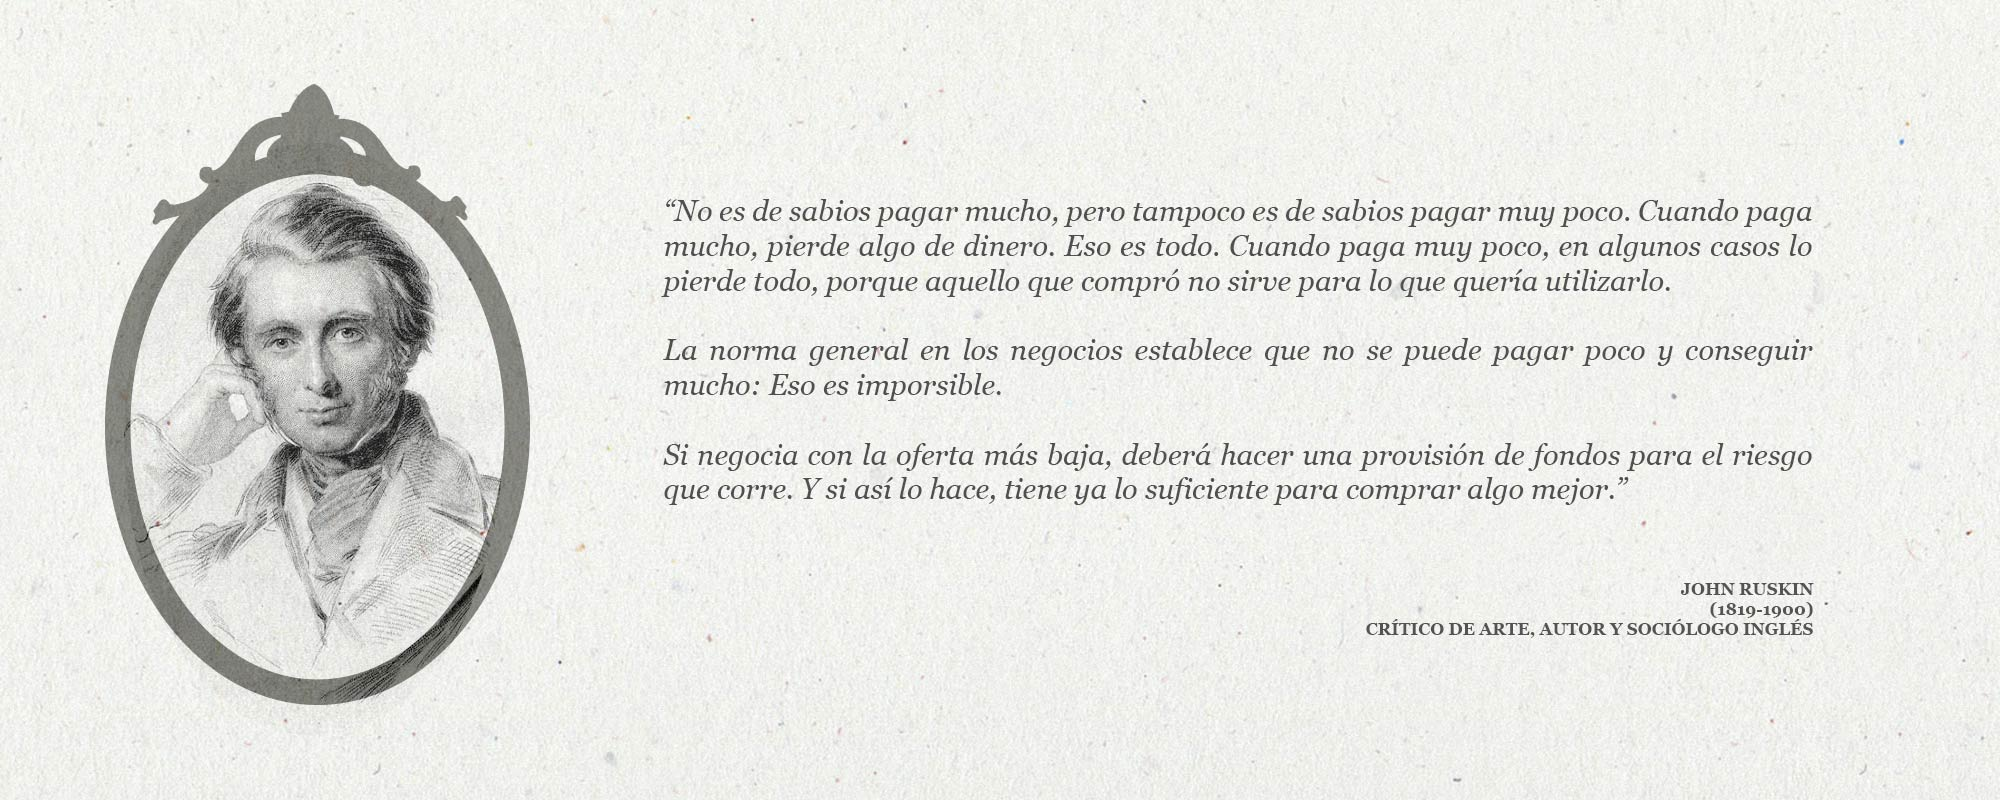 Cita de John Ruskin